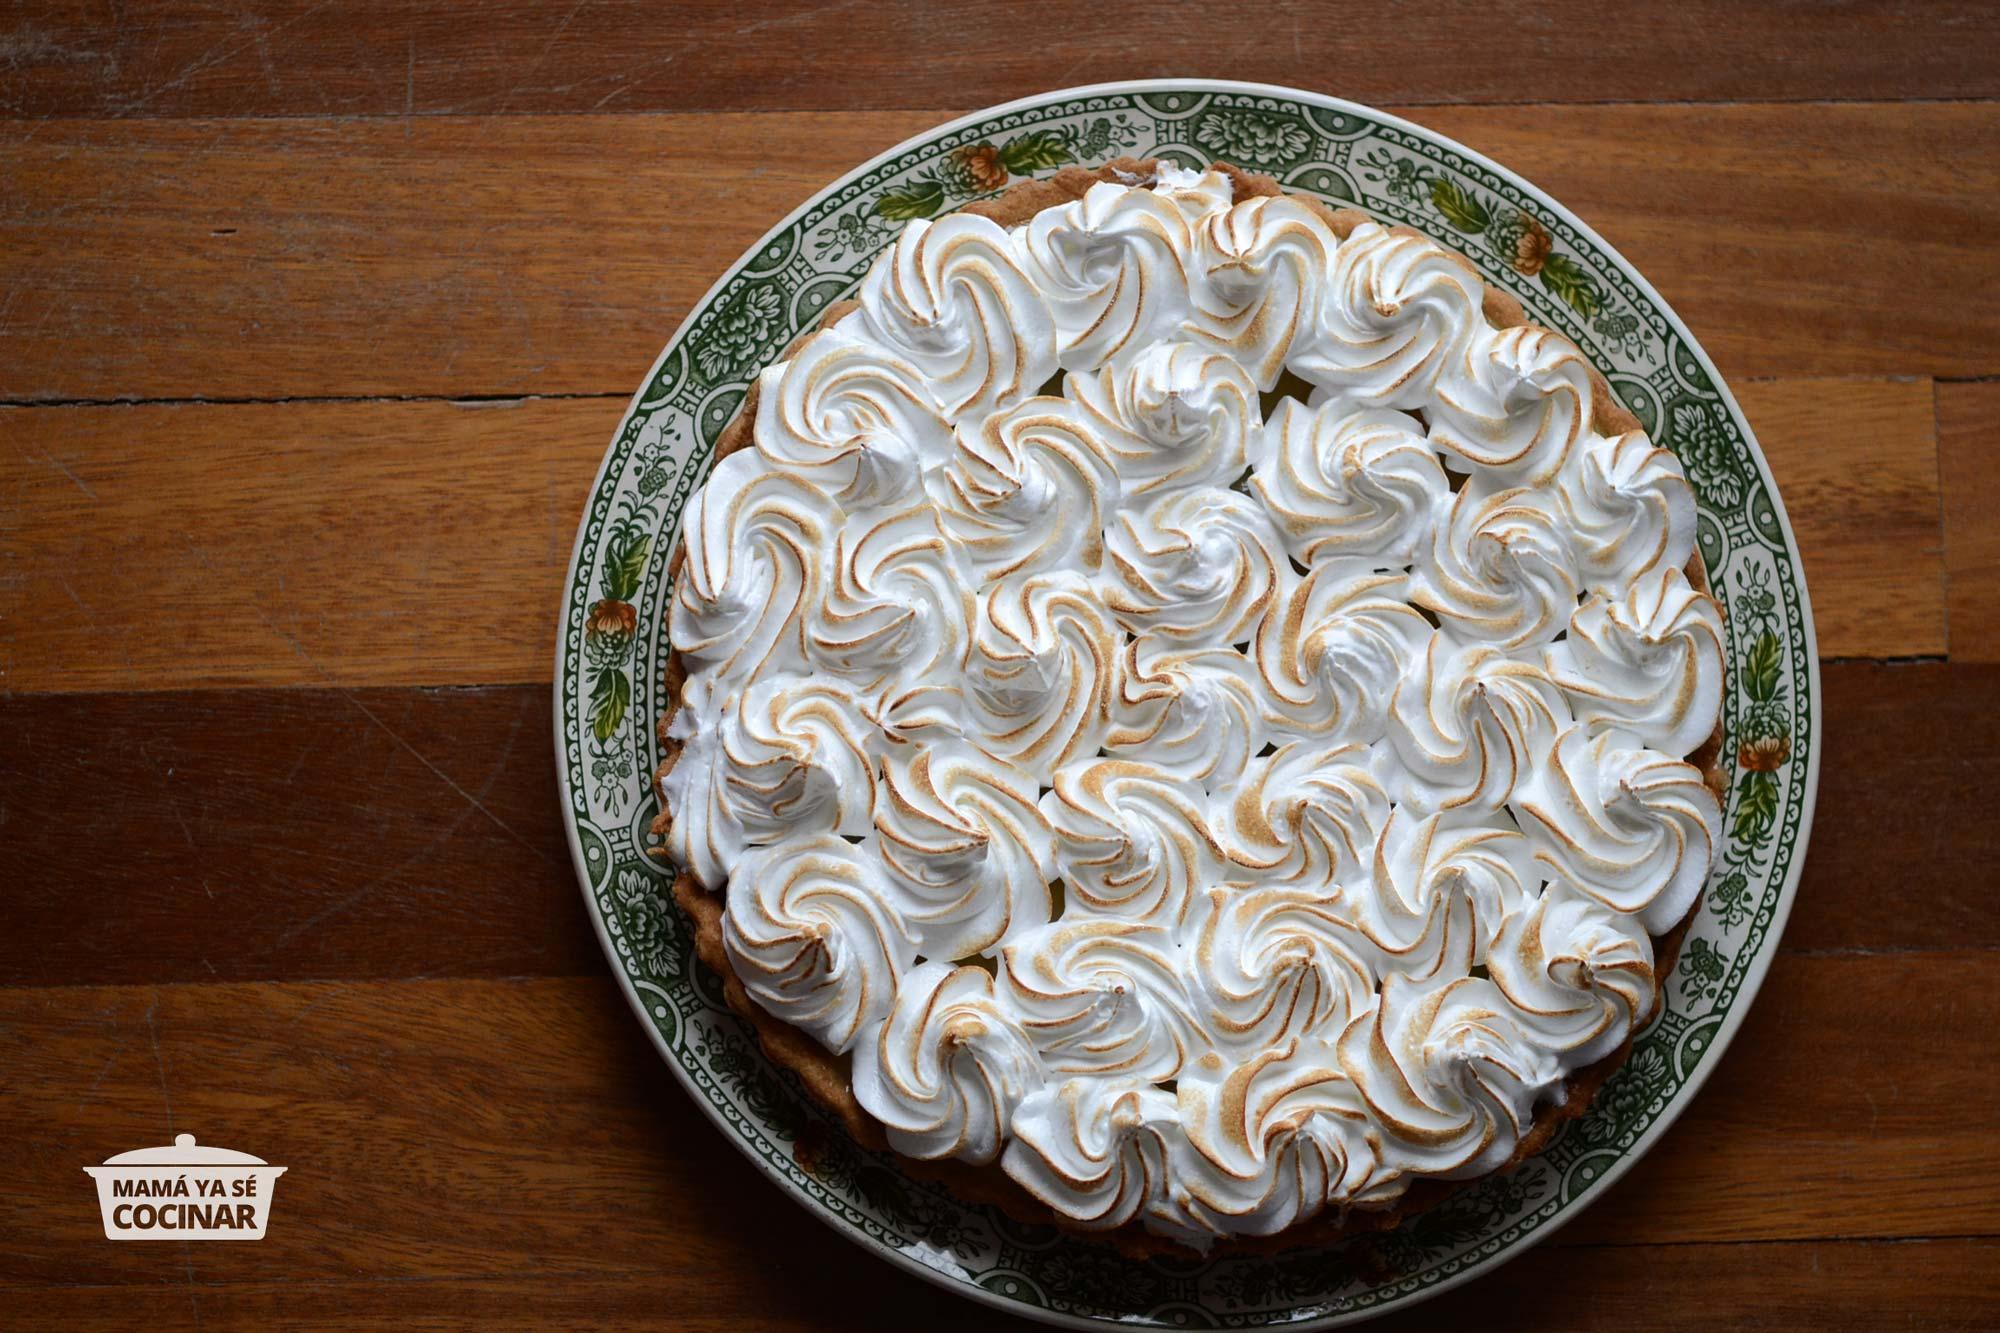 Lemon Pie o Tarta de limón y merengue